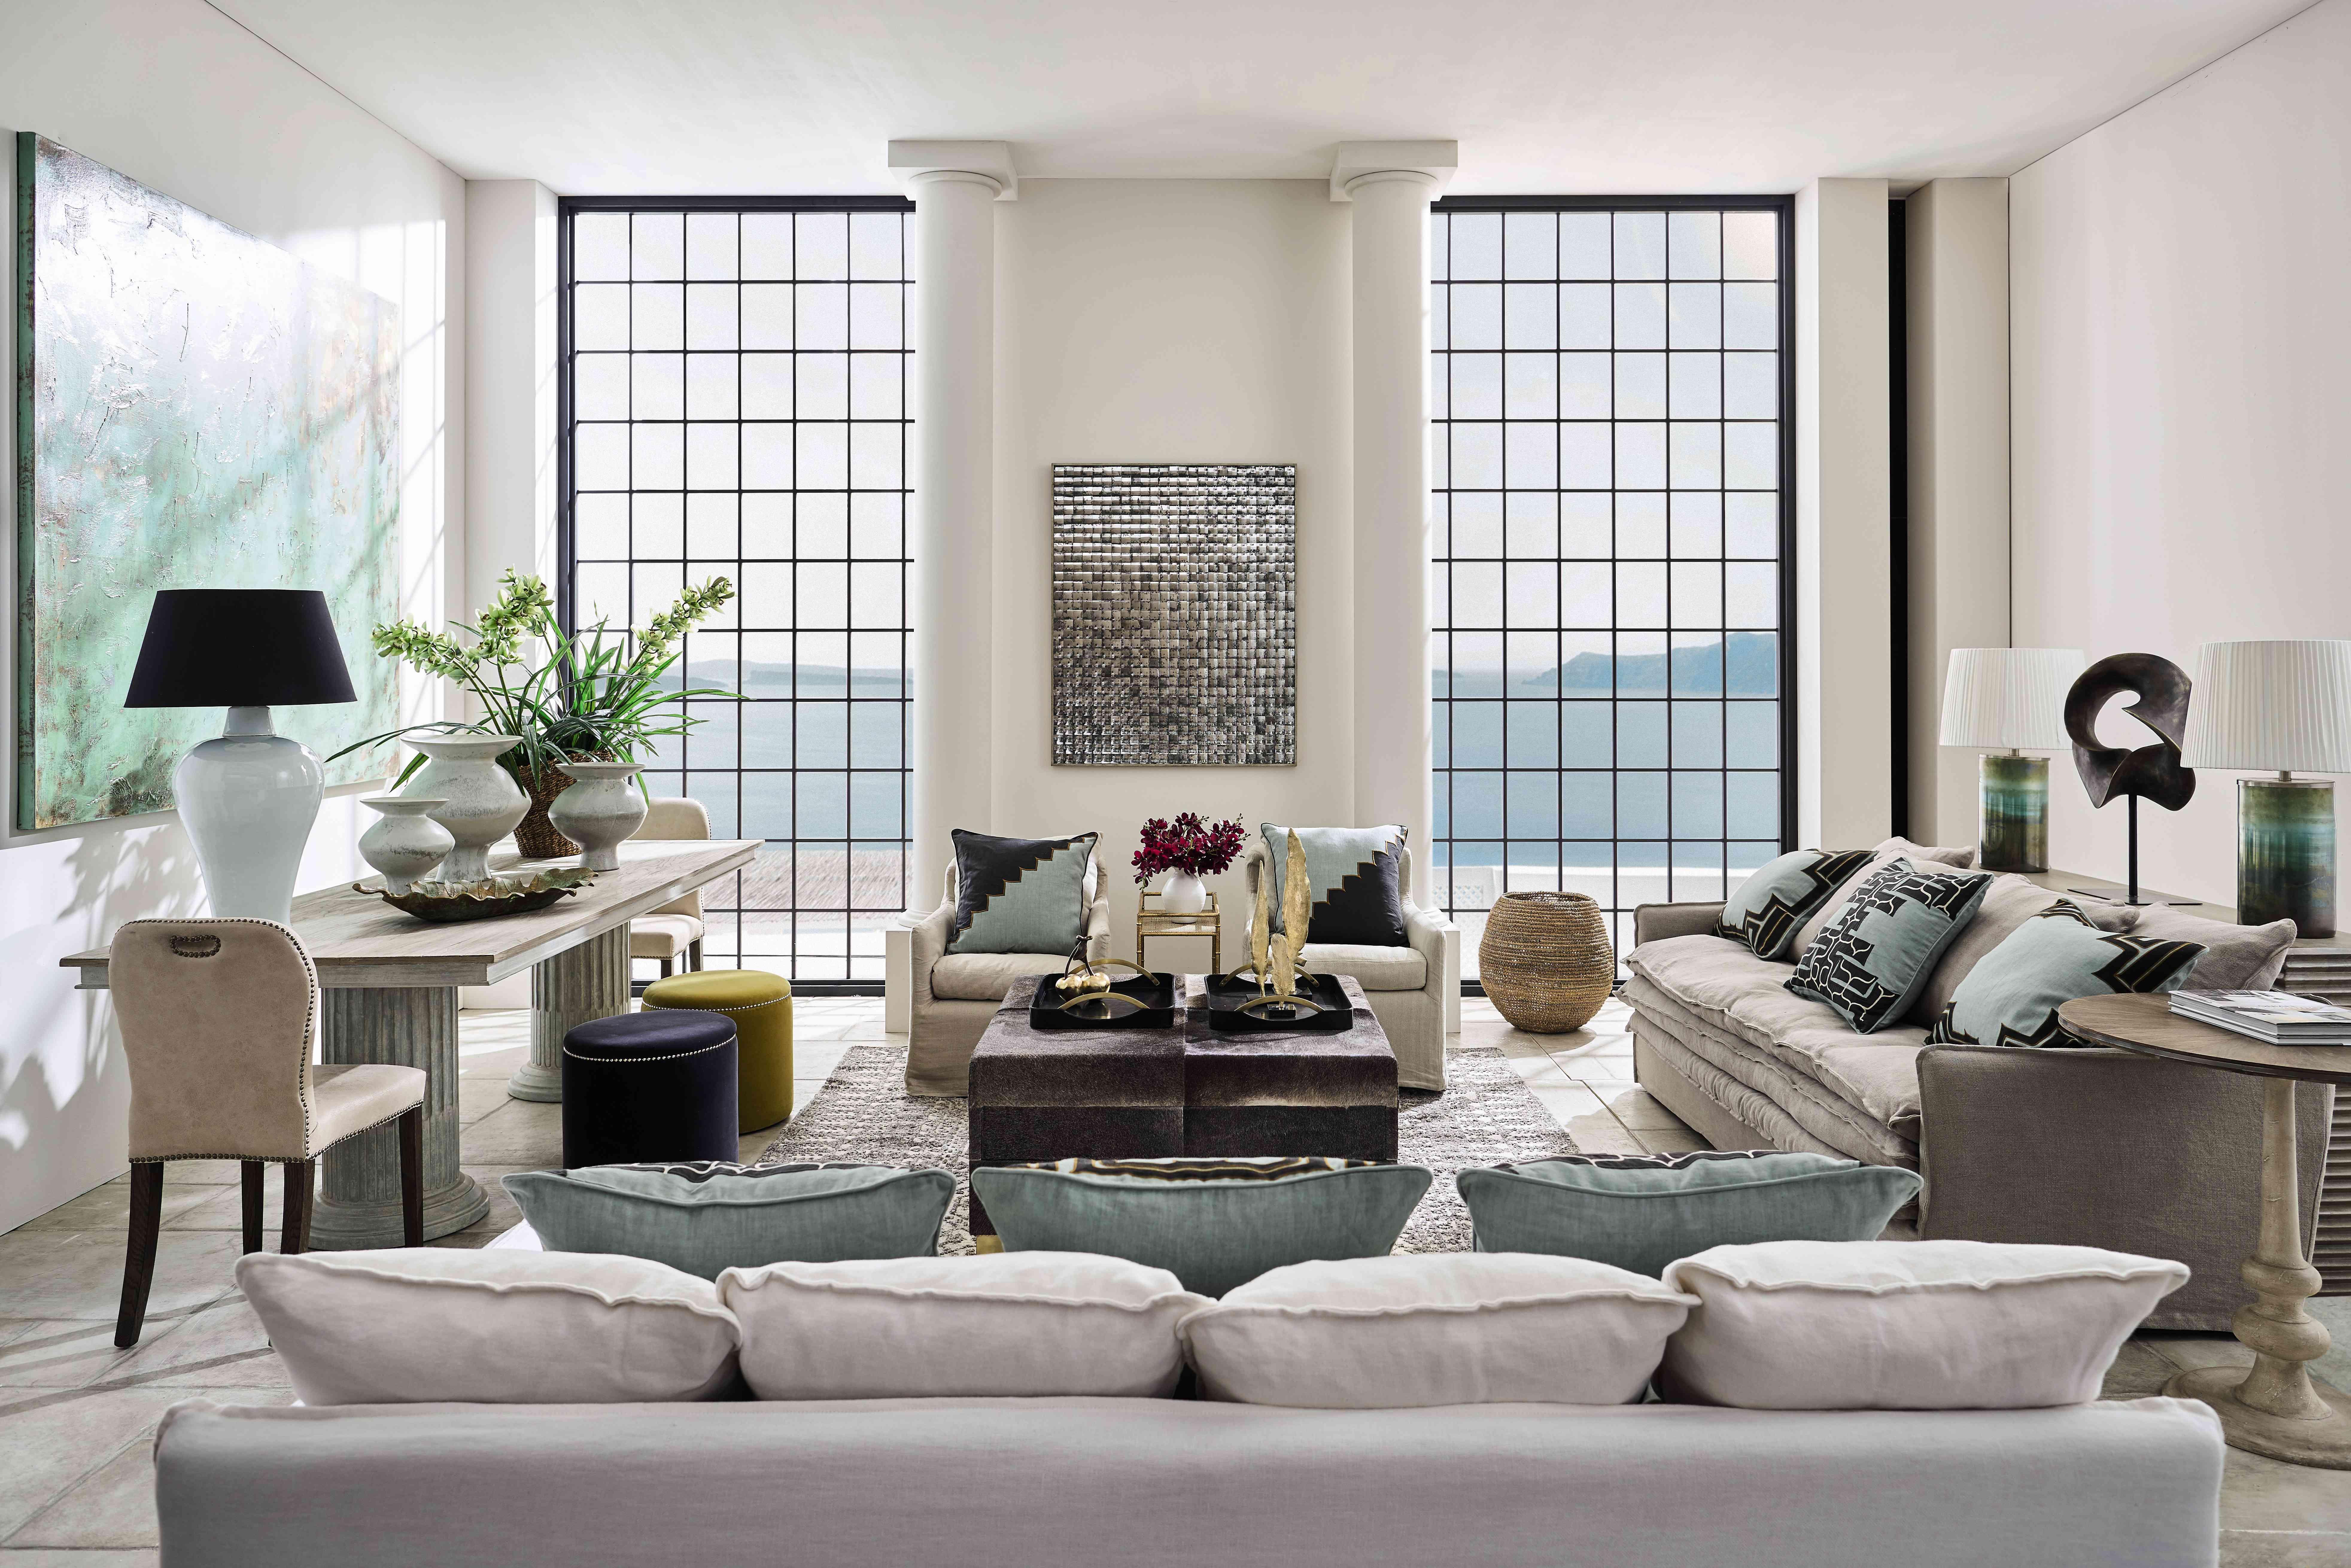 Sitting room by Sue Jones of OKA